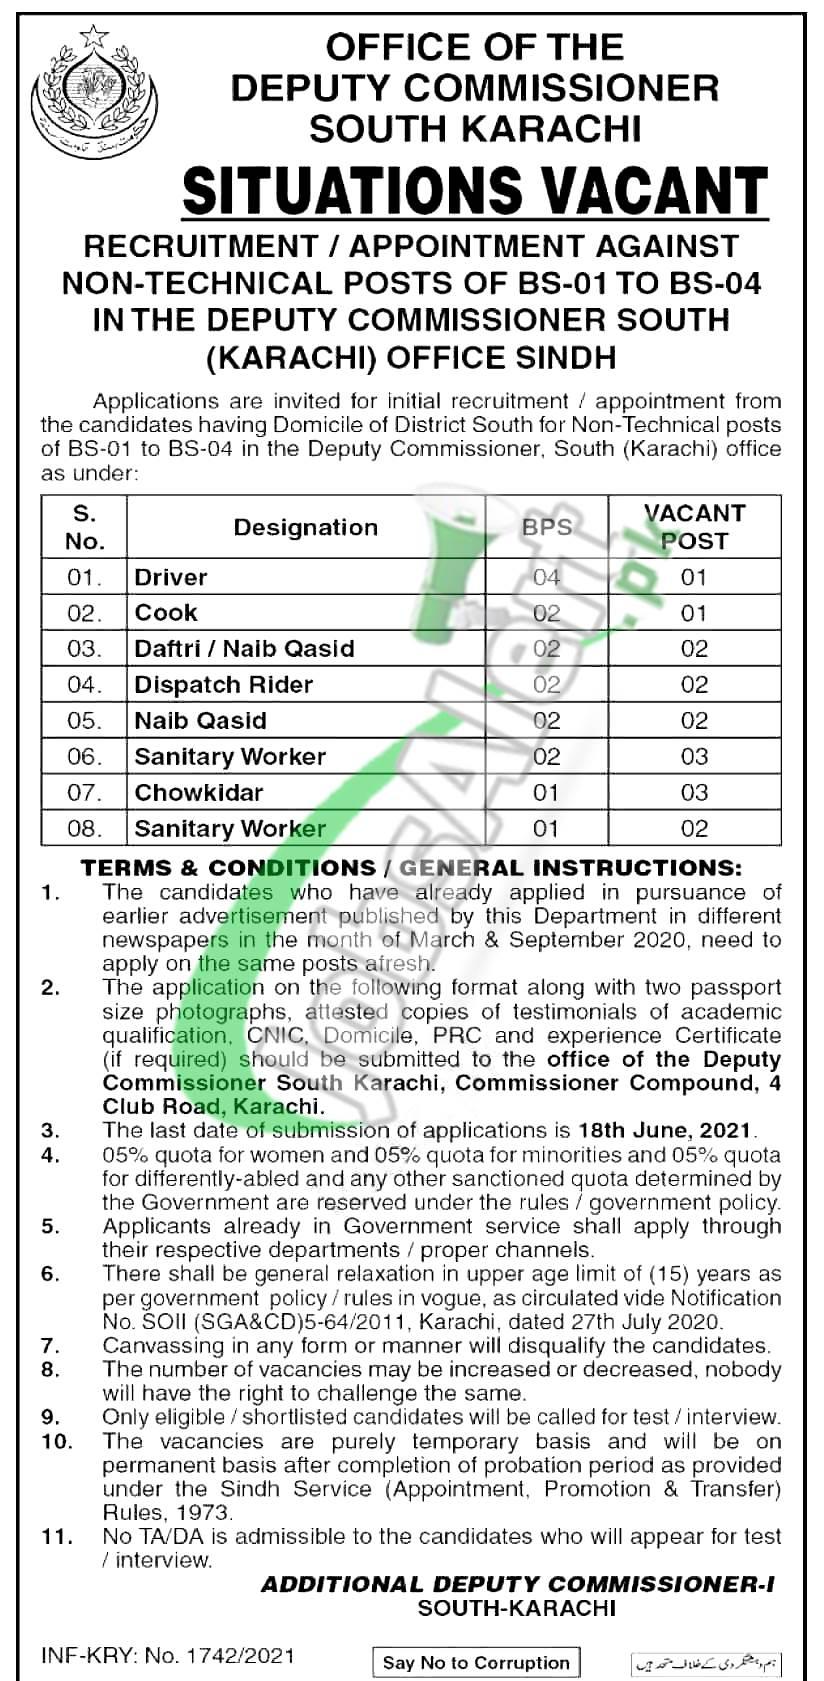 Deputy Commissioner Office South Karachi Jobs